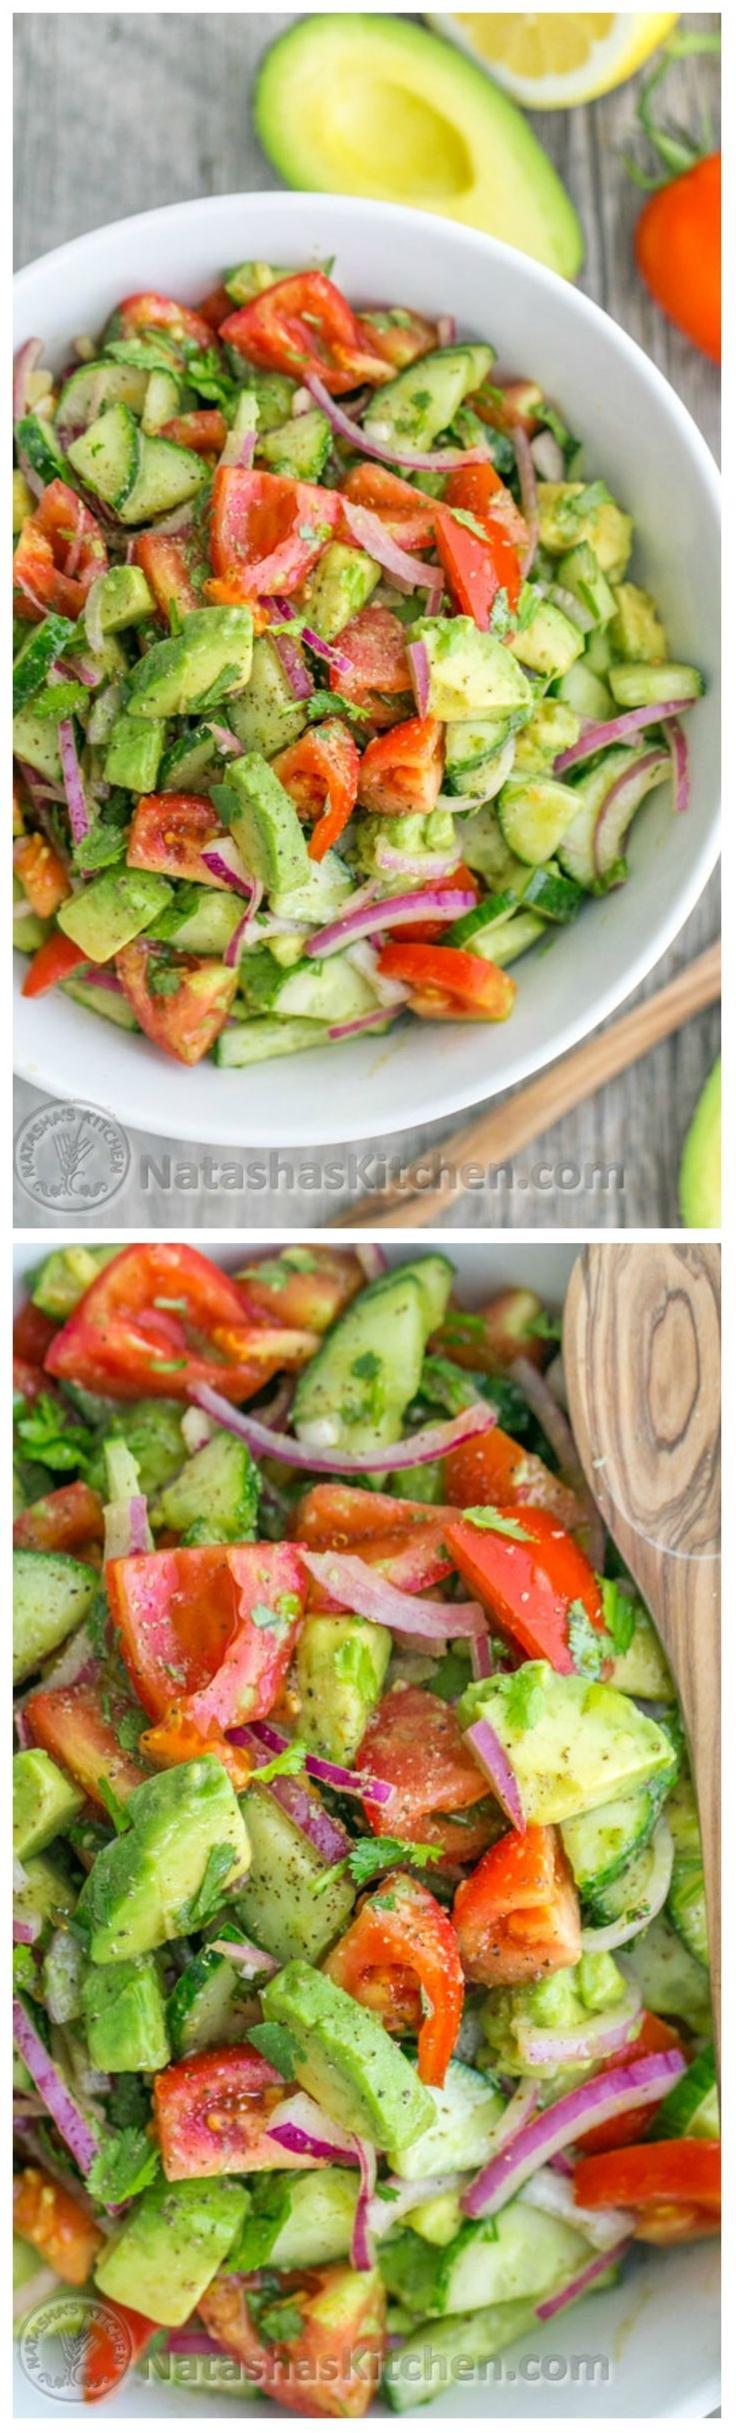 This Cucumber Tomato Avocado Salad recipe is a keeper! Easy, Excellent Salad\n\n Ingredients for Tomato Avocado Salad:\n  1 lb Roma tomatoes\n 1 English cucumber\n 1/2 medium red onion, sliced\n 2 avocados, diced\n 2 Tbsp extra virgin olive oil or sunflower oil\n Juice of 1 medium lemon (about 2 Tbsp)\n 1/4 cup (1/2 bunch) cilantro, chopped\n 1 tsp sea salt or 3/4 tsp table salt\n 1/8 tsp black pepper